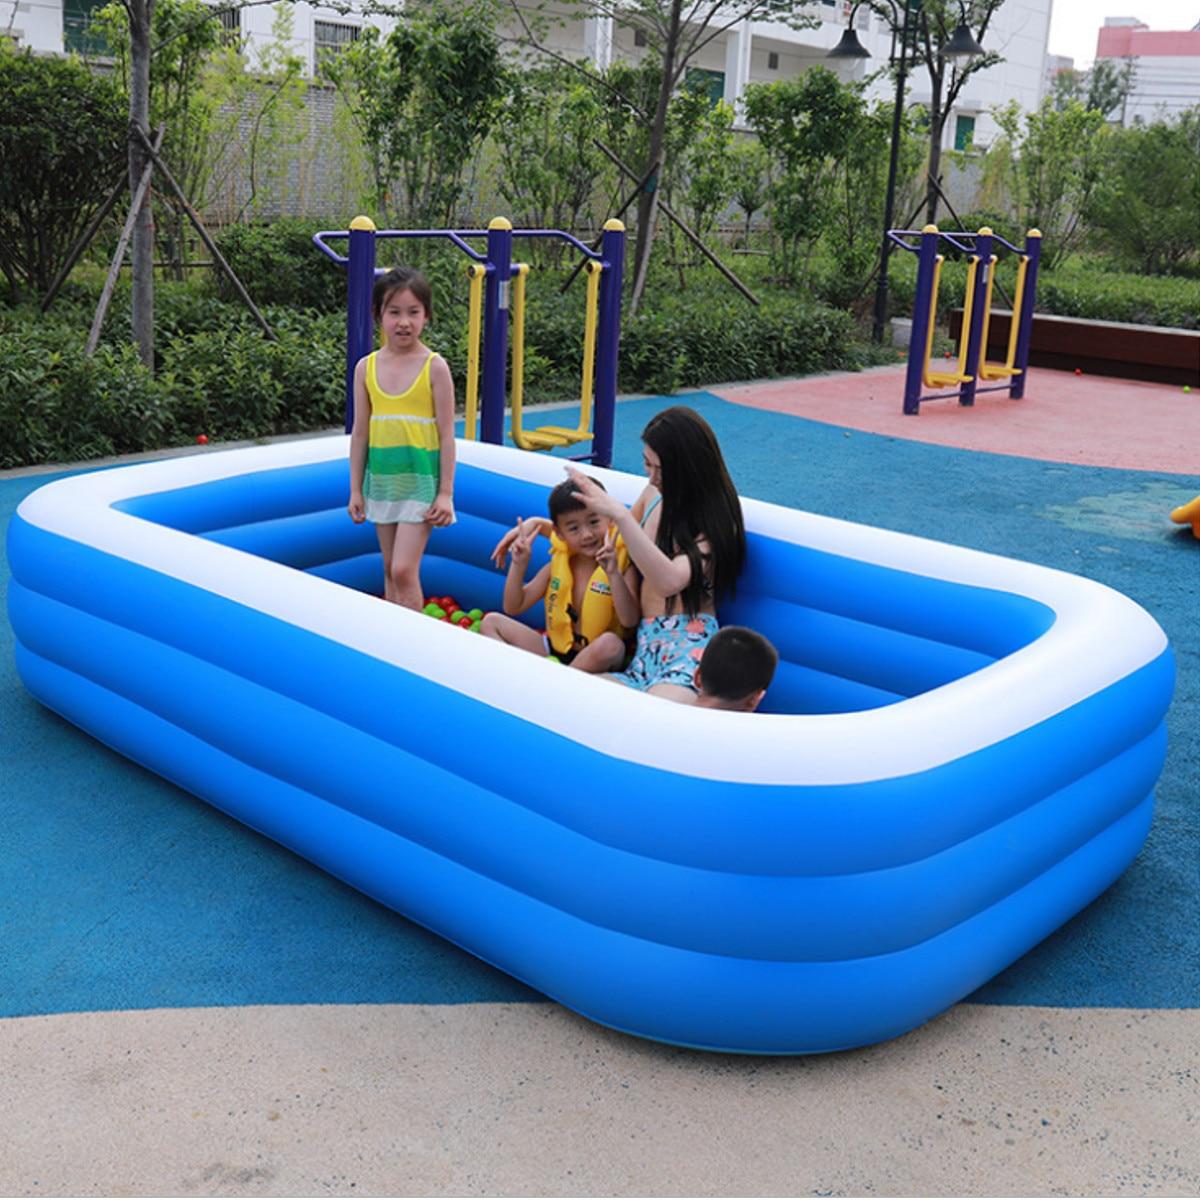 3 Layers Portable Inflatable Swimming Pool Environmental PVC Warm Adults Kids Bath Bathtub Foldable Outdoor Indoor Bathroom SPA